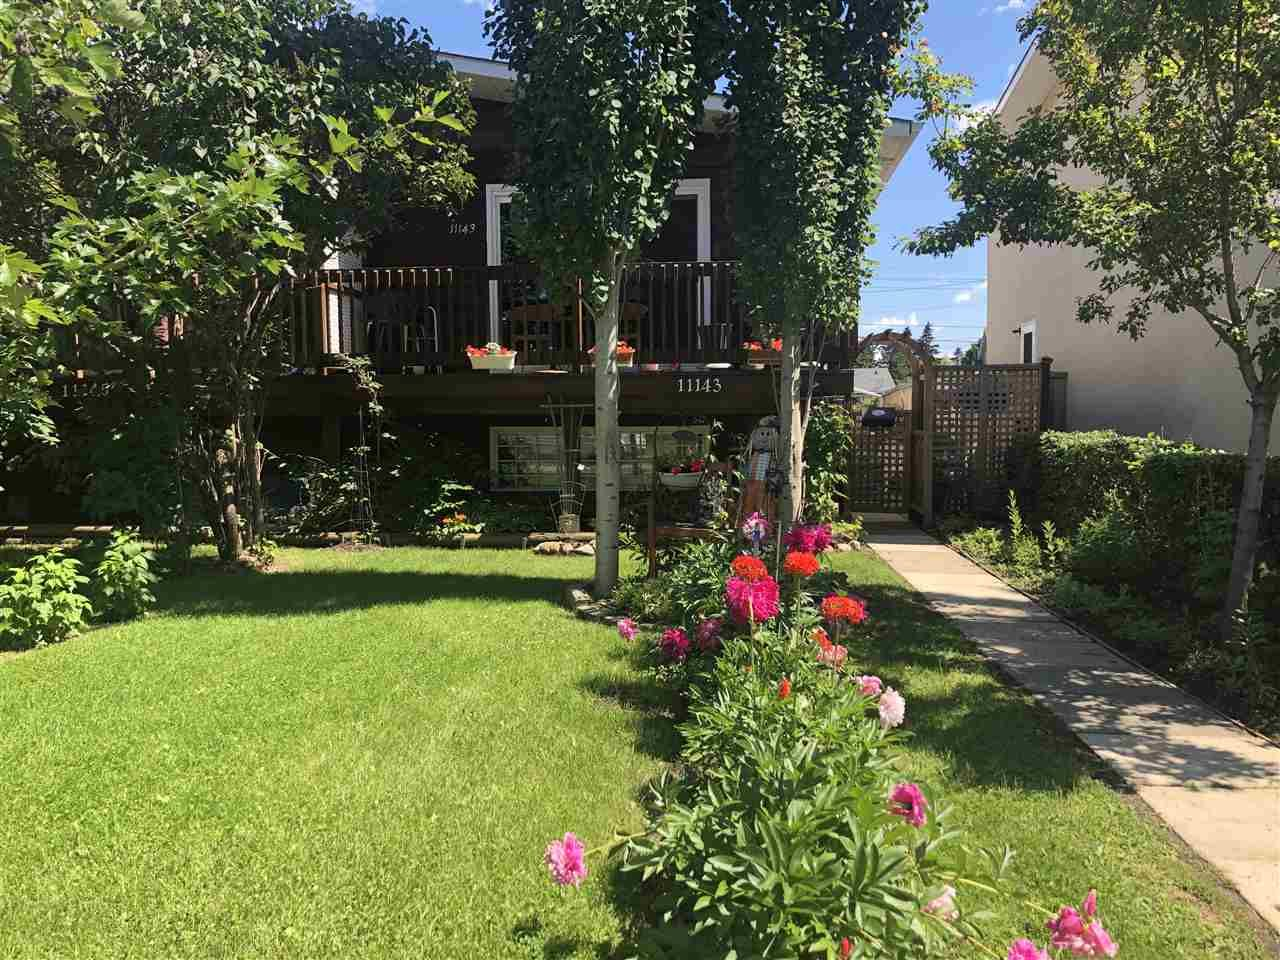 Main Photo: 11143 51 Street in Edmonton: Zone 09 House Half Duplex for sale : MLS®# E4238959